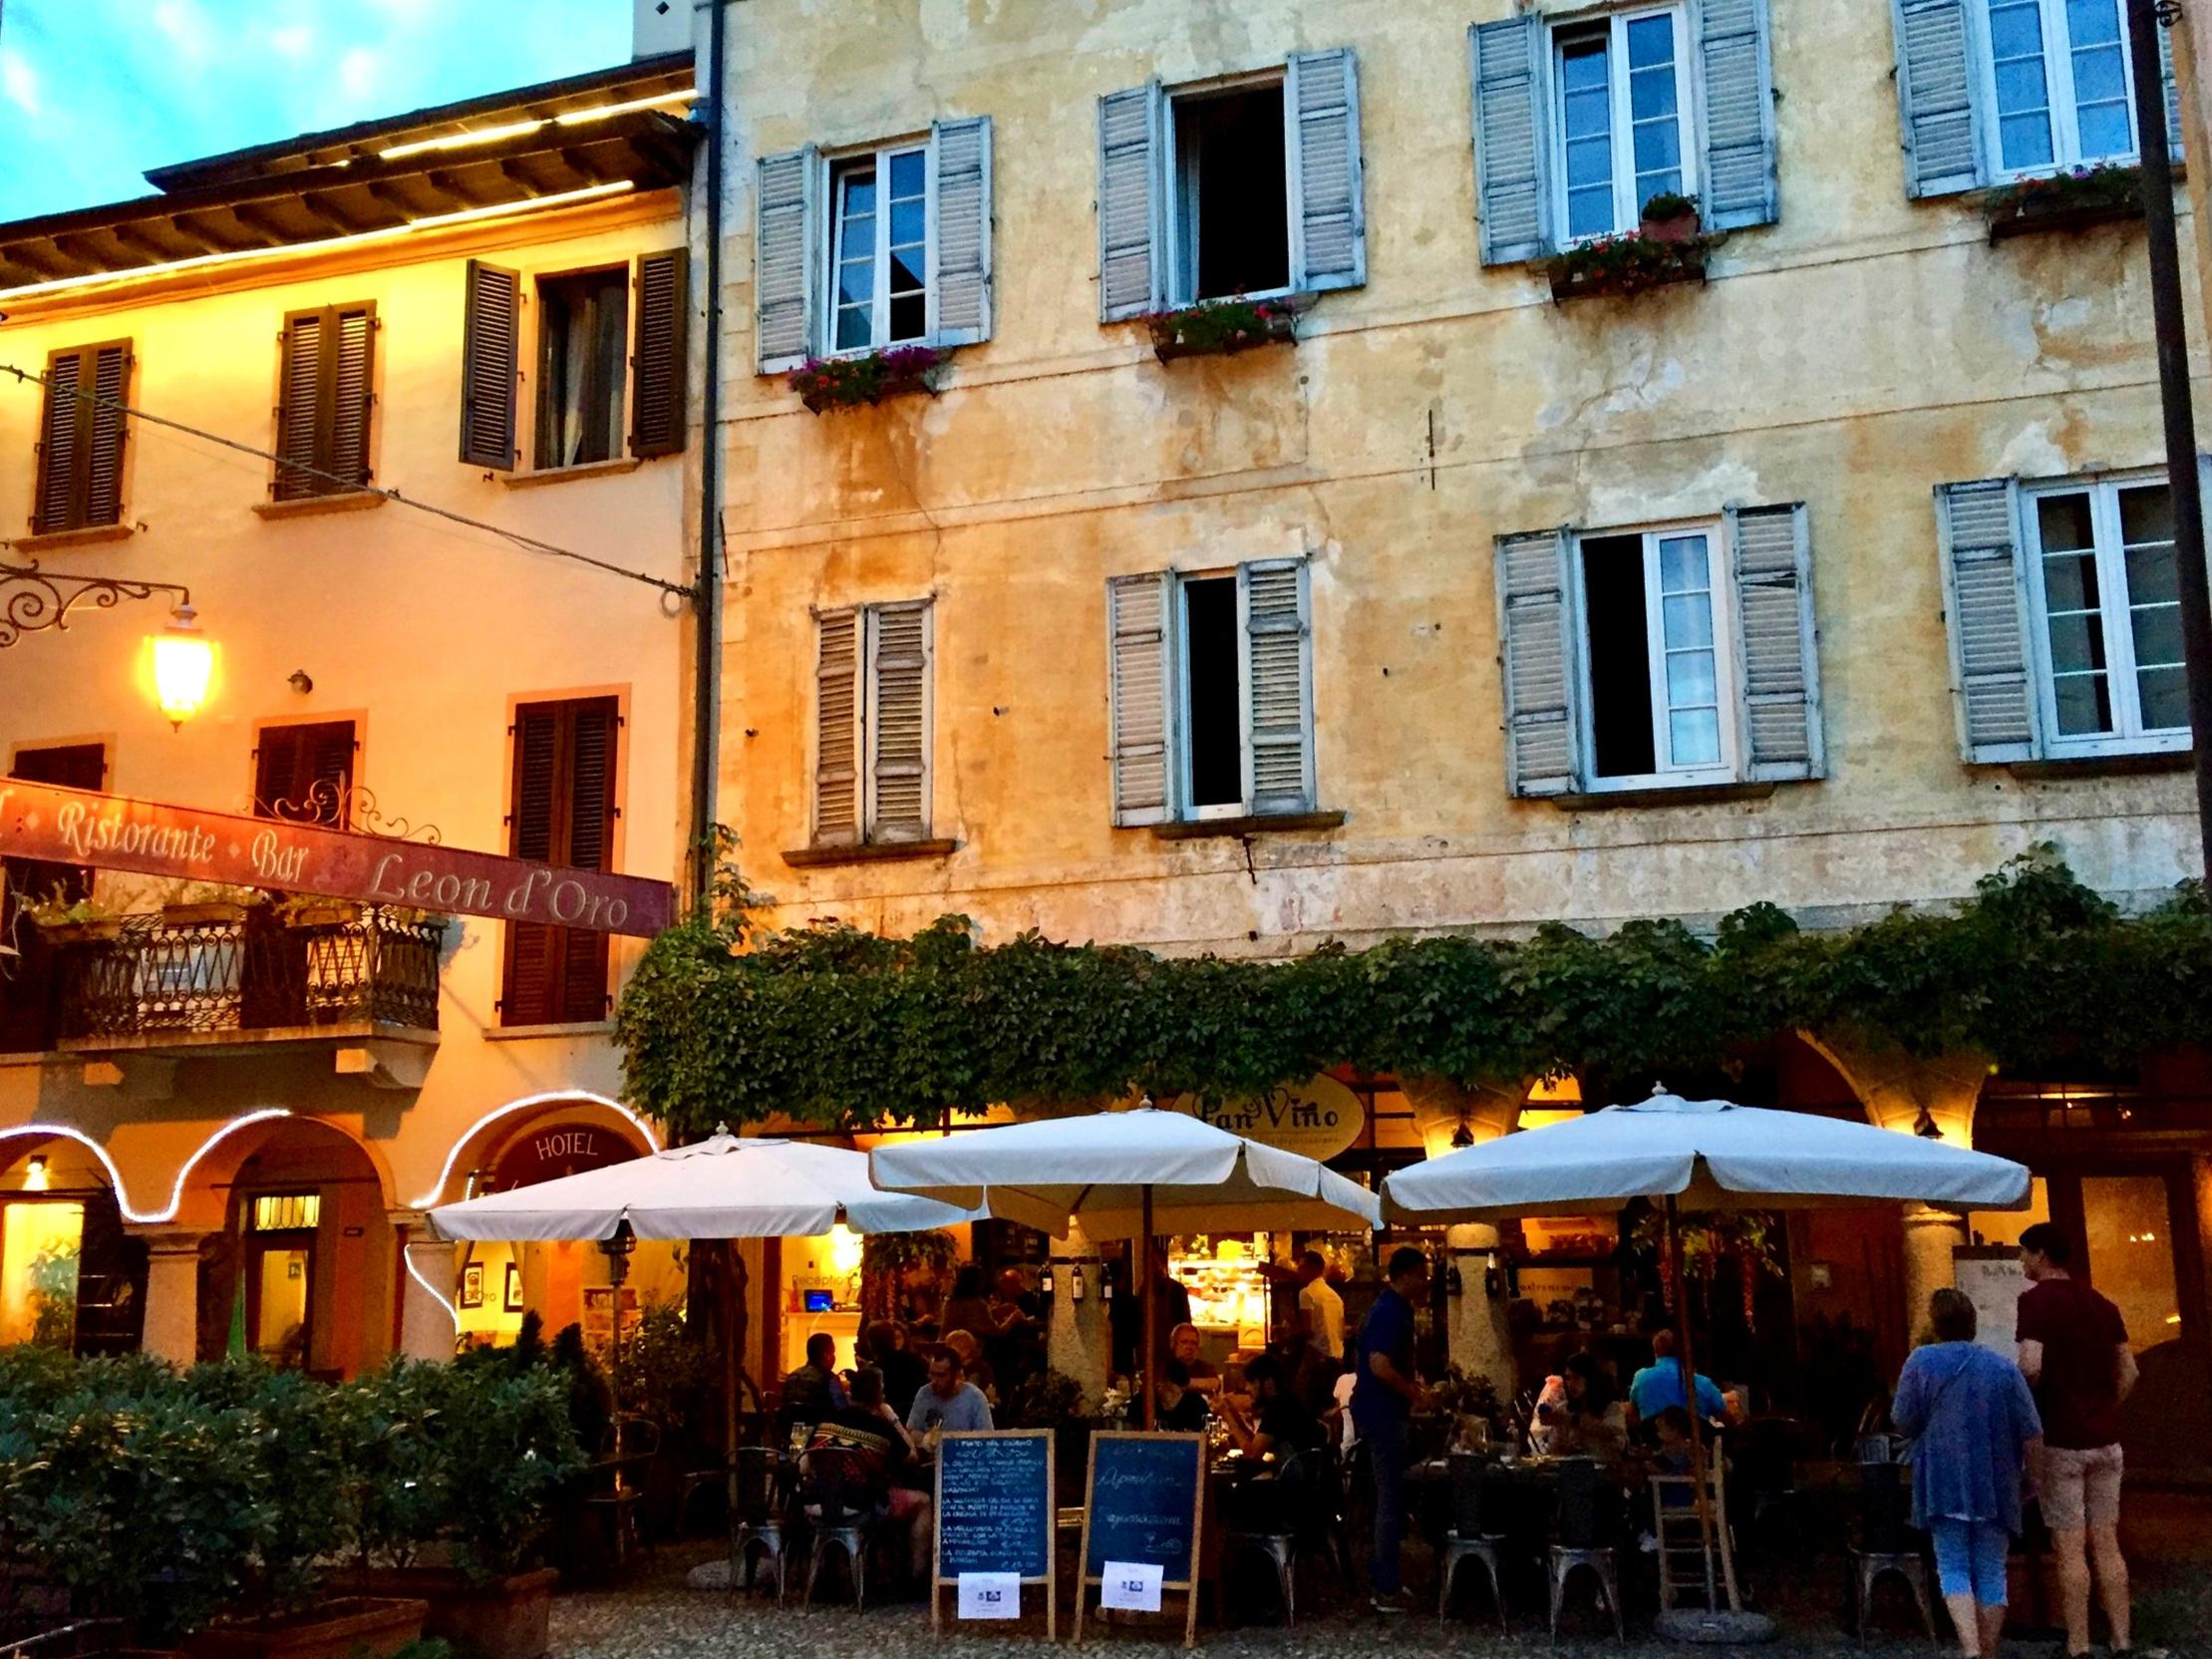 Summer dinner in the piazza - Piedmont Lake region